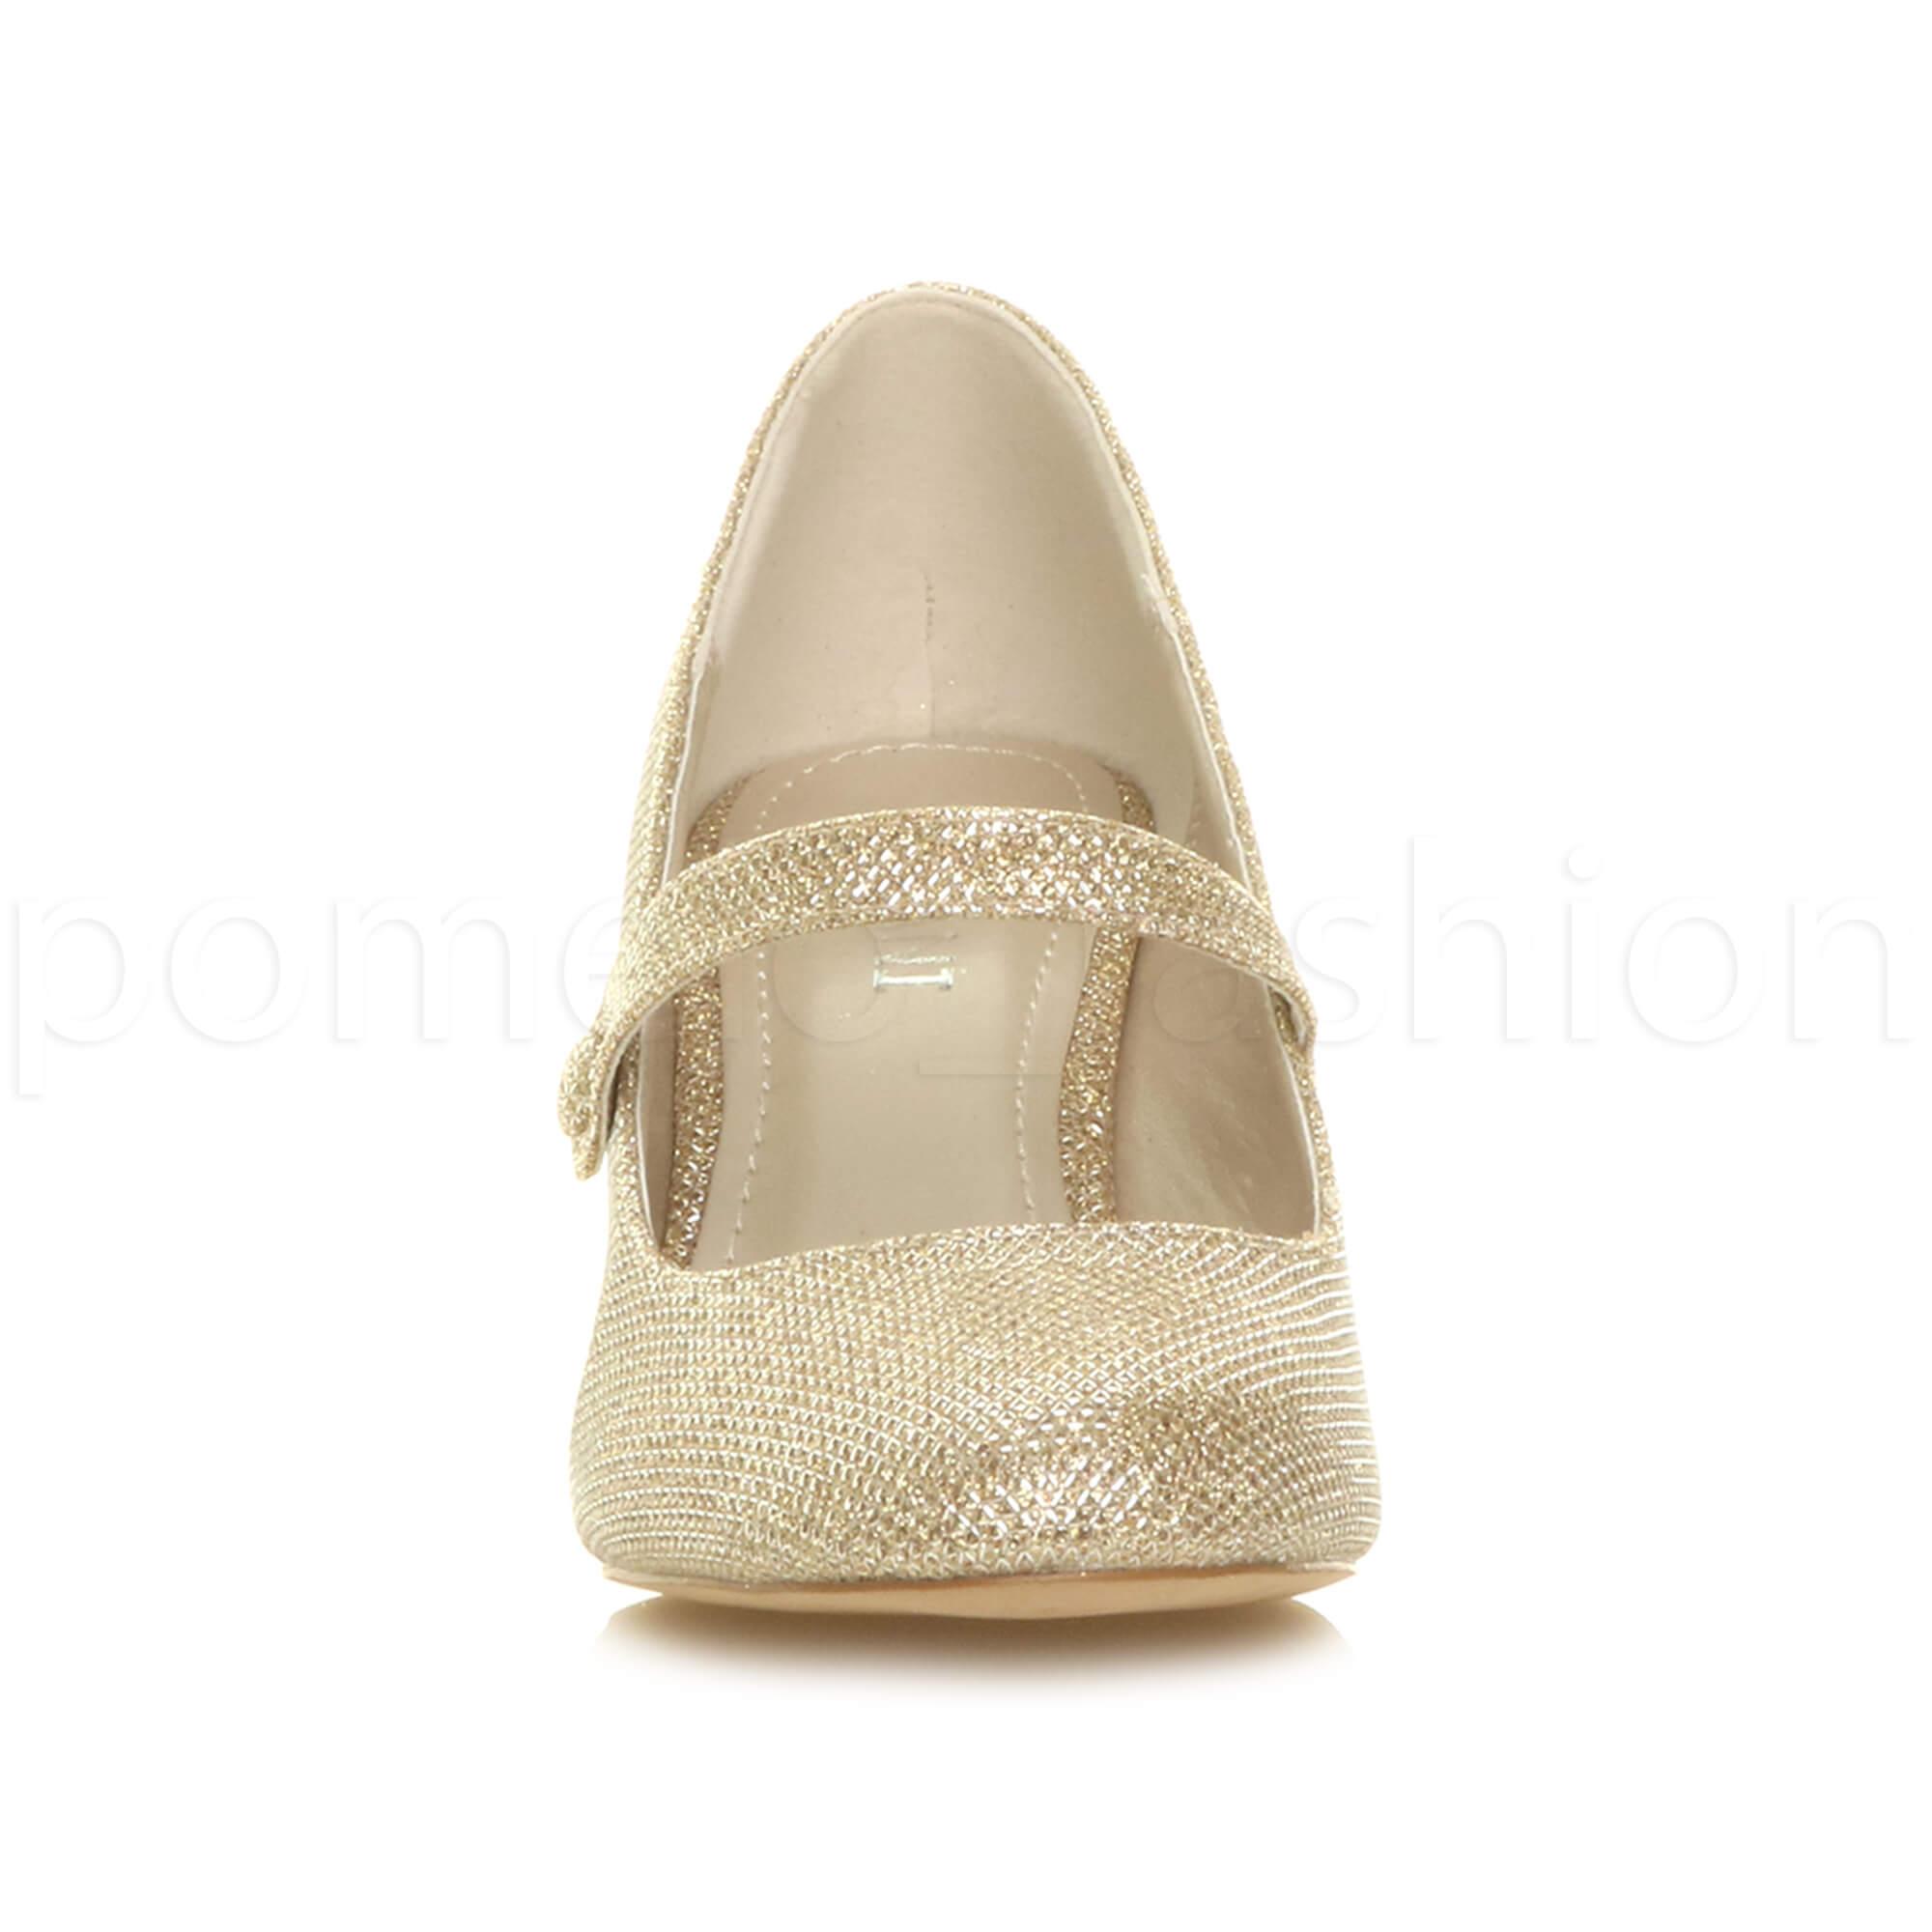 miniatura 76 - Donna basso tacco medio Mary Jane Damigella Matrimonio Pompe Scarpe Da Sera Taglia